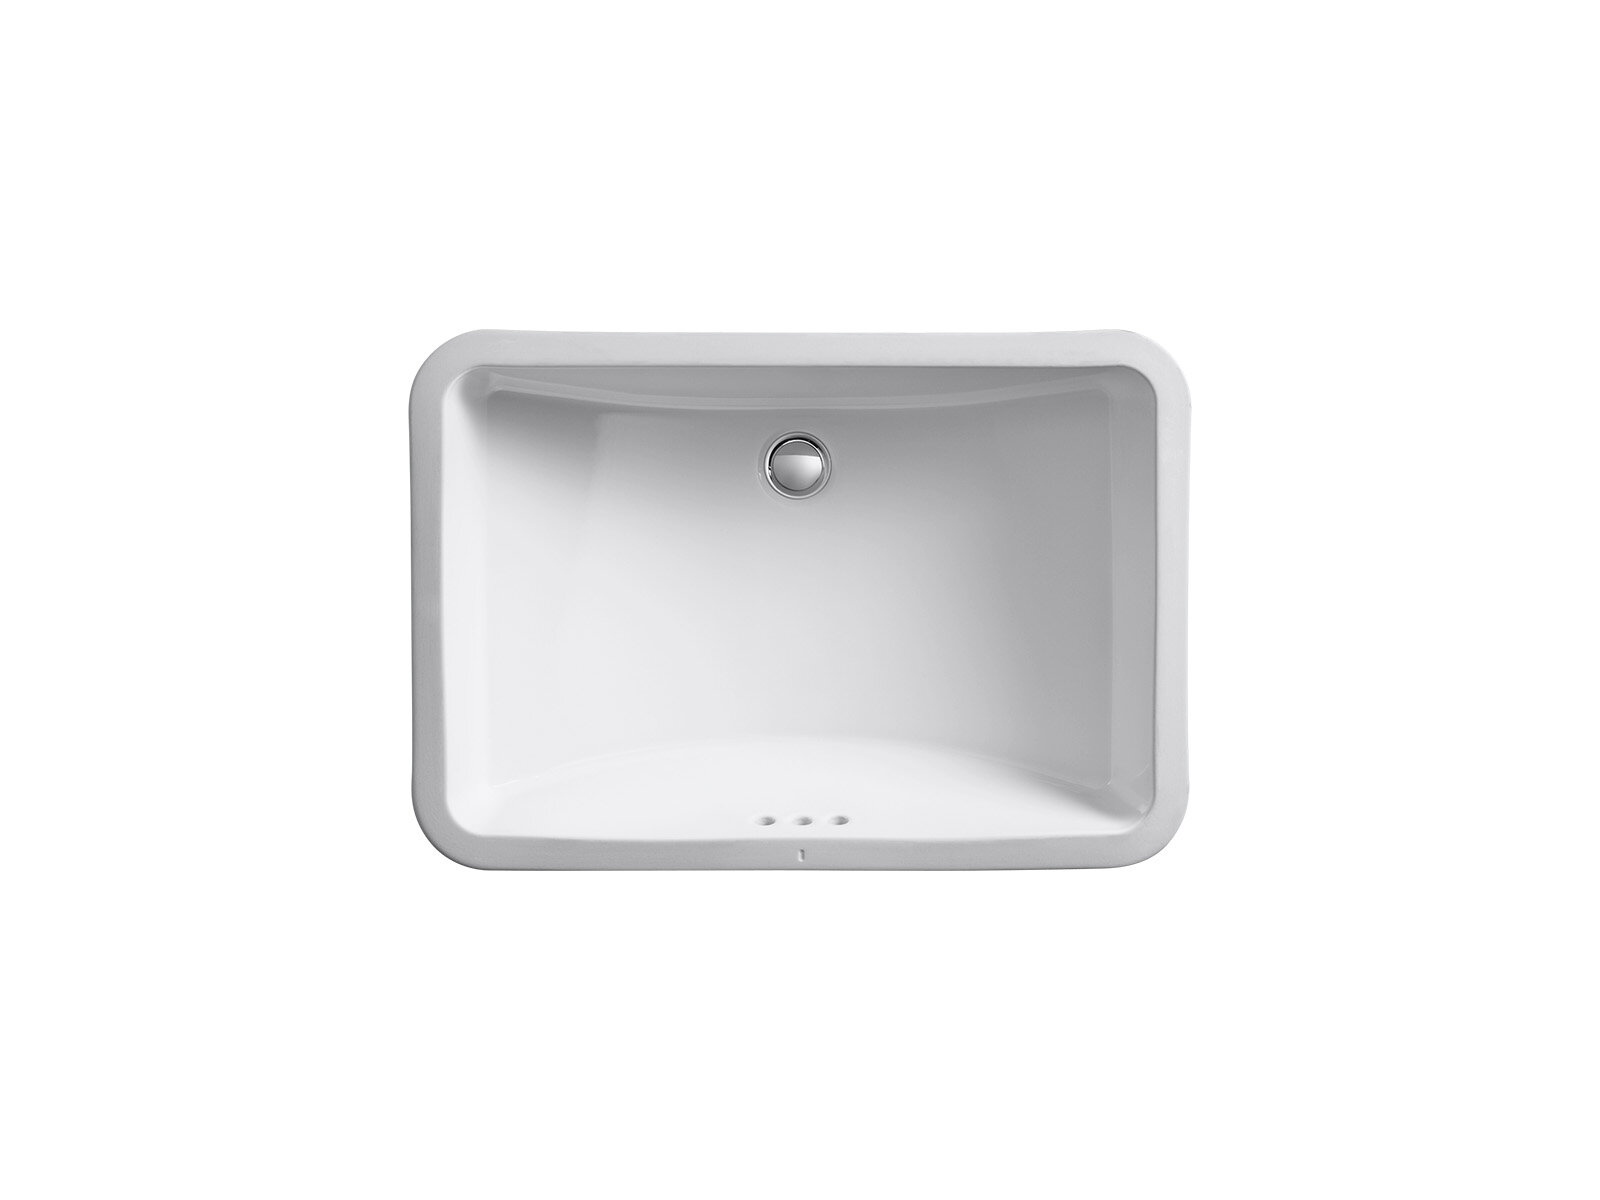 Ladena Ceramic Rectangular Undermount Bathroom Sink With Overflow Reviews Allmodern